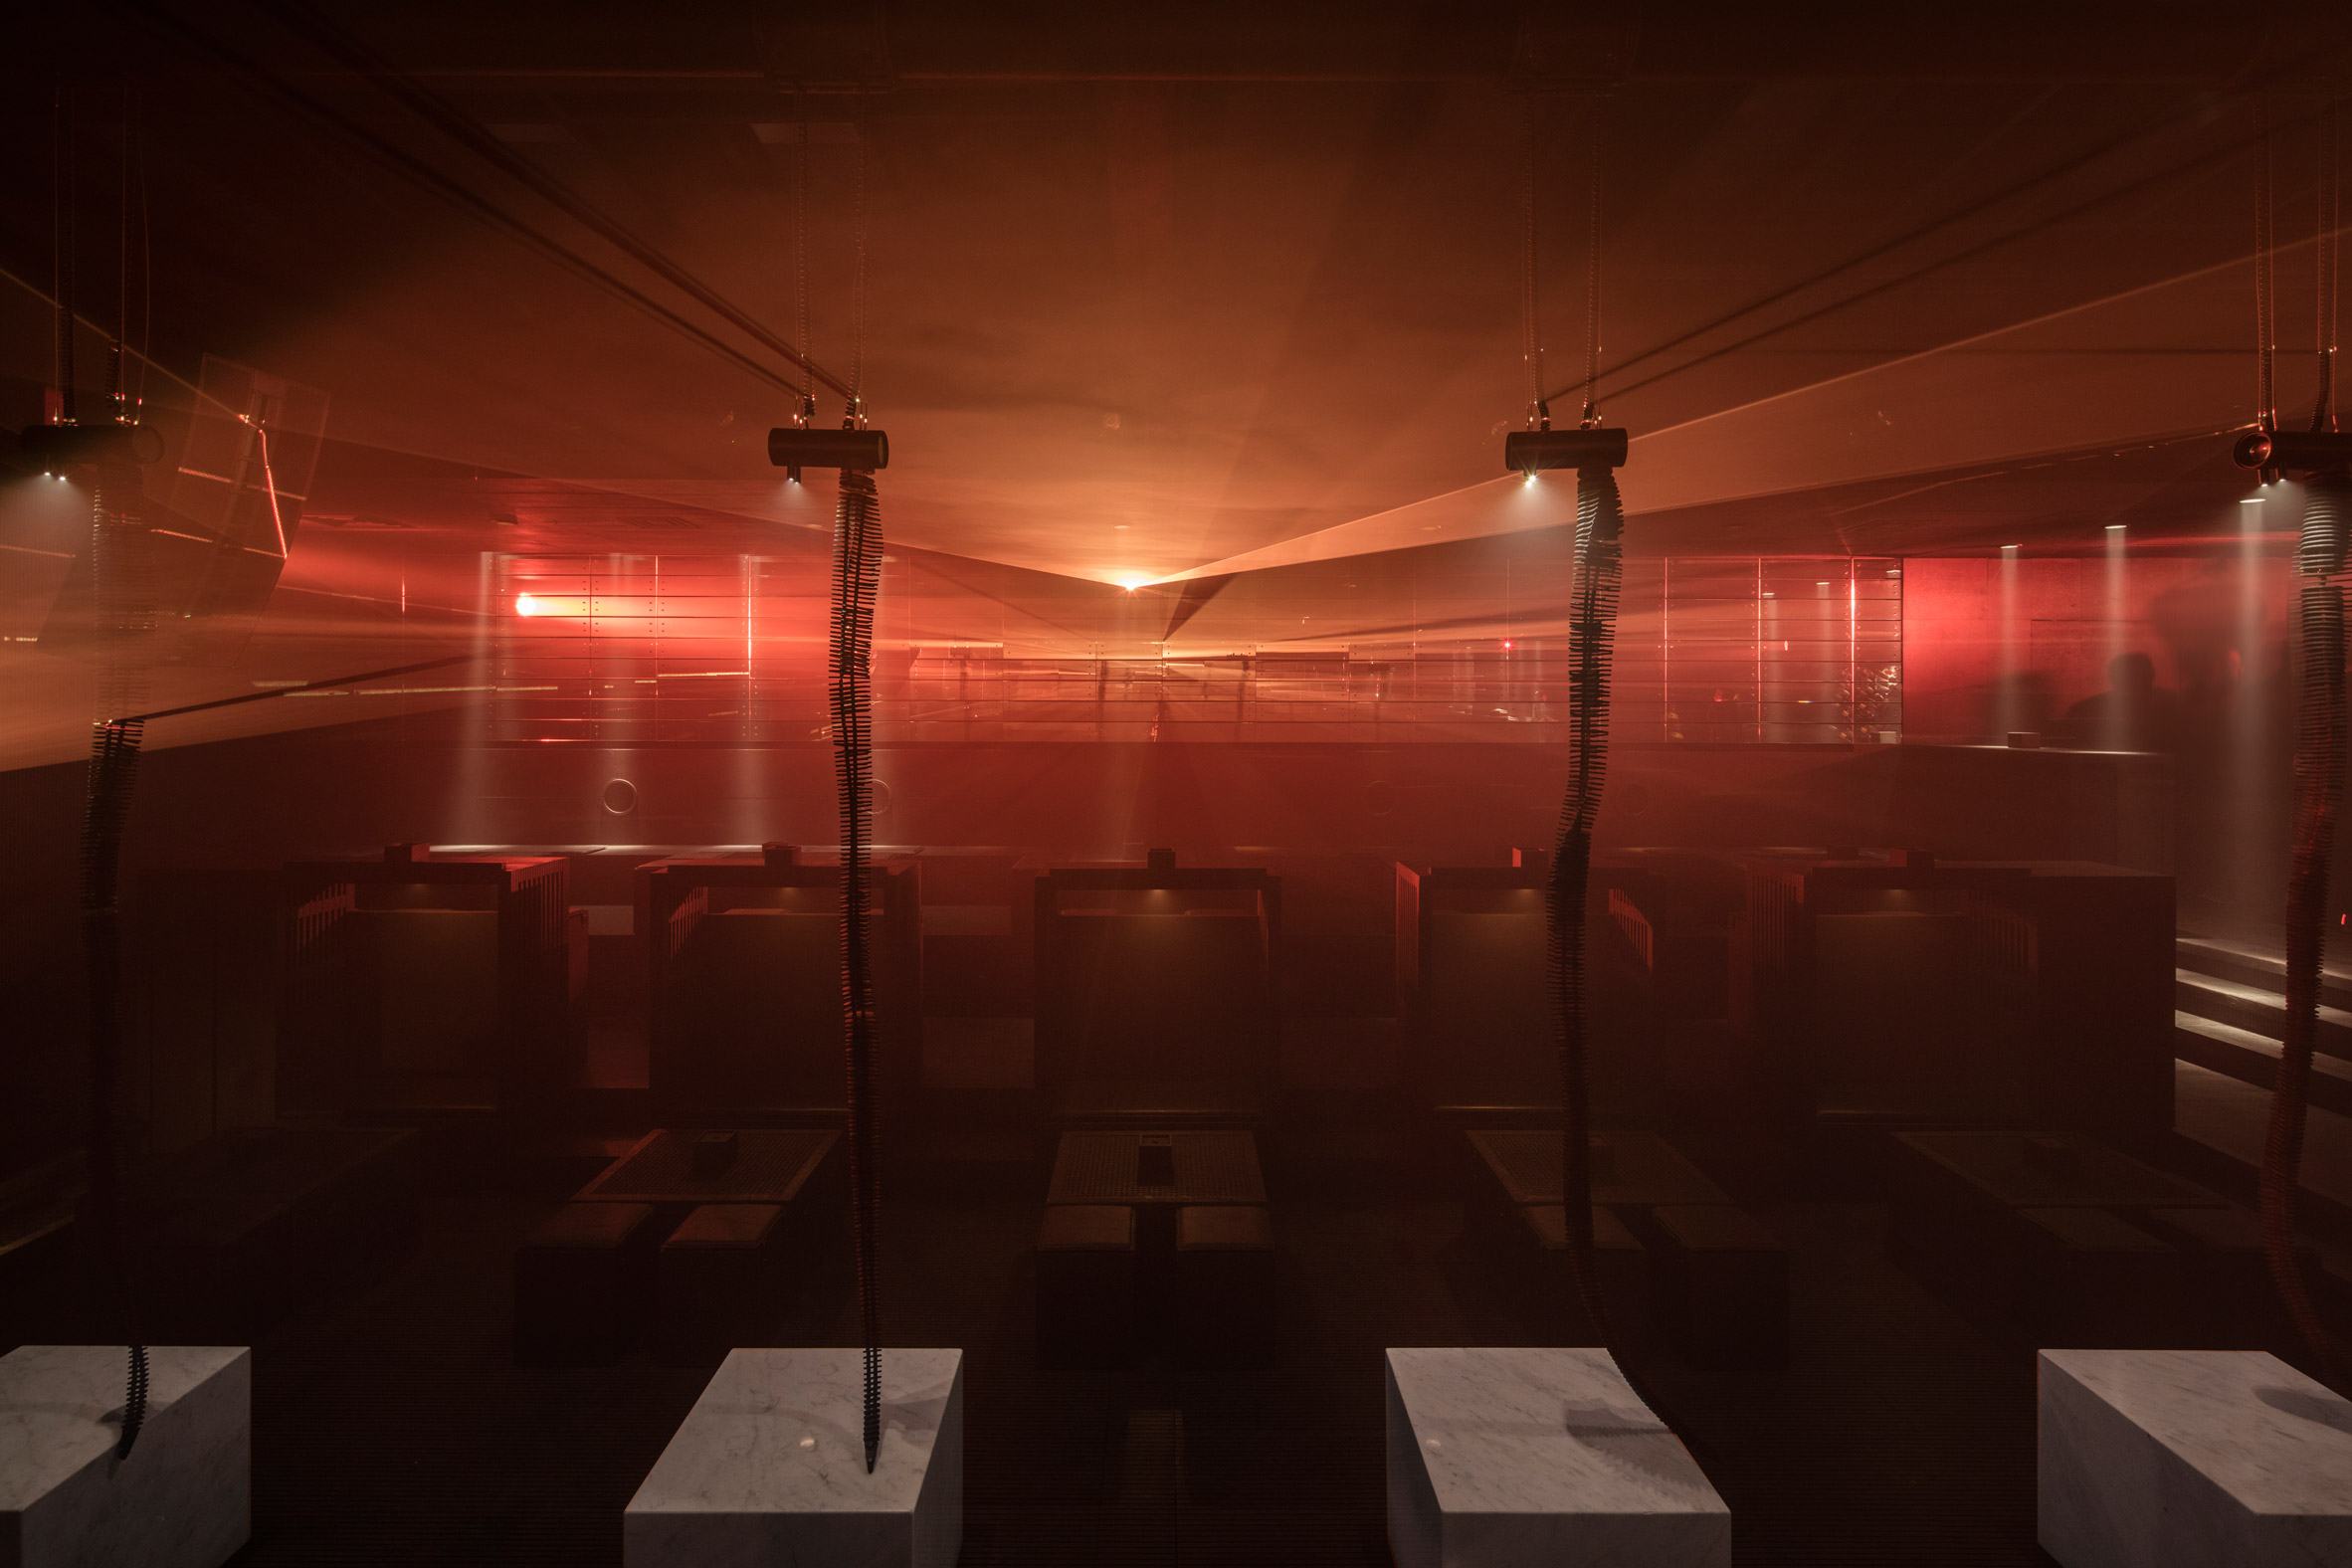 B018 bunker nightclub refurbishment by Bernard Khoury